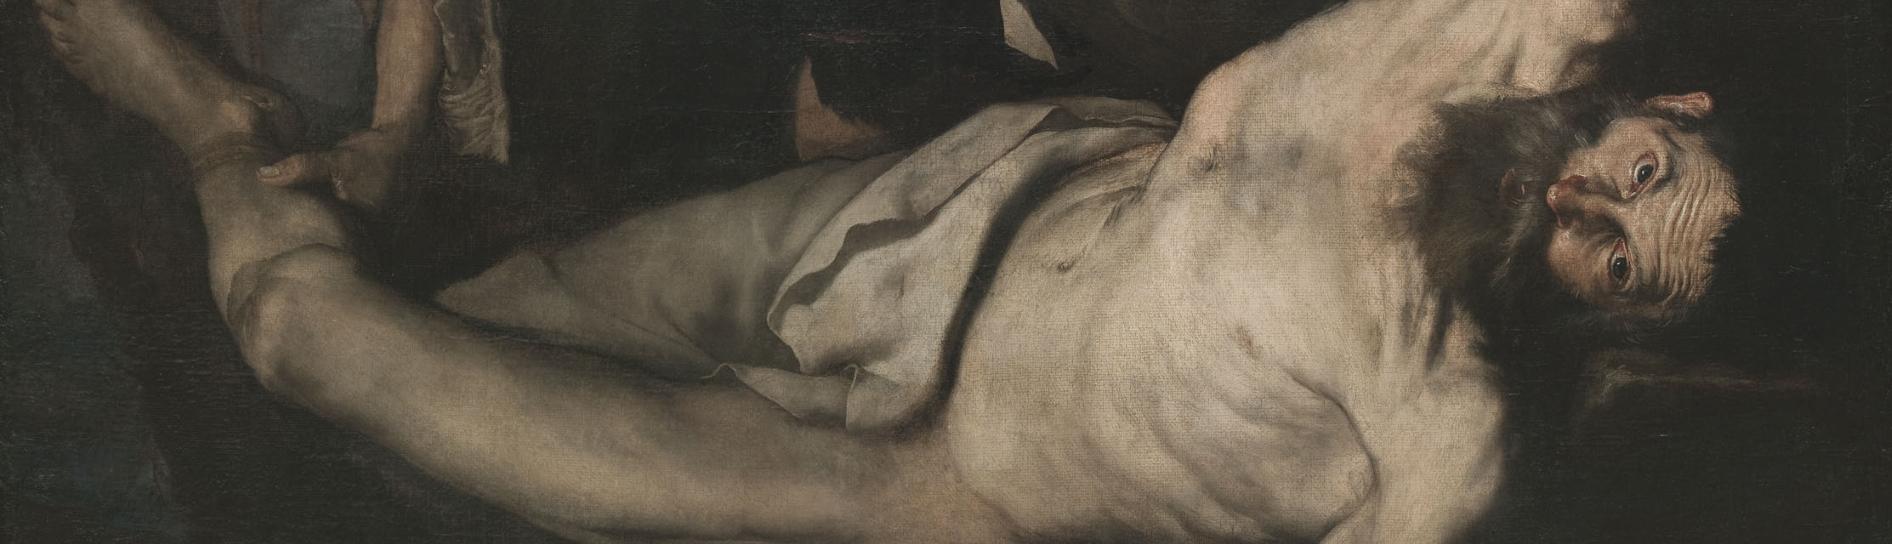 Jusepe de Ribera (Lo Spagnoletto), Martyrdom of Saint Bartholomew, 1644